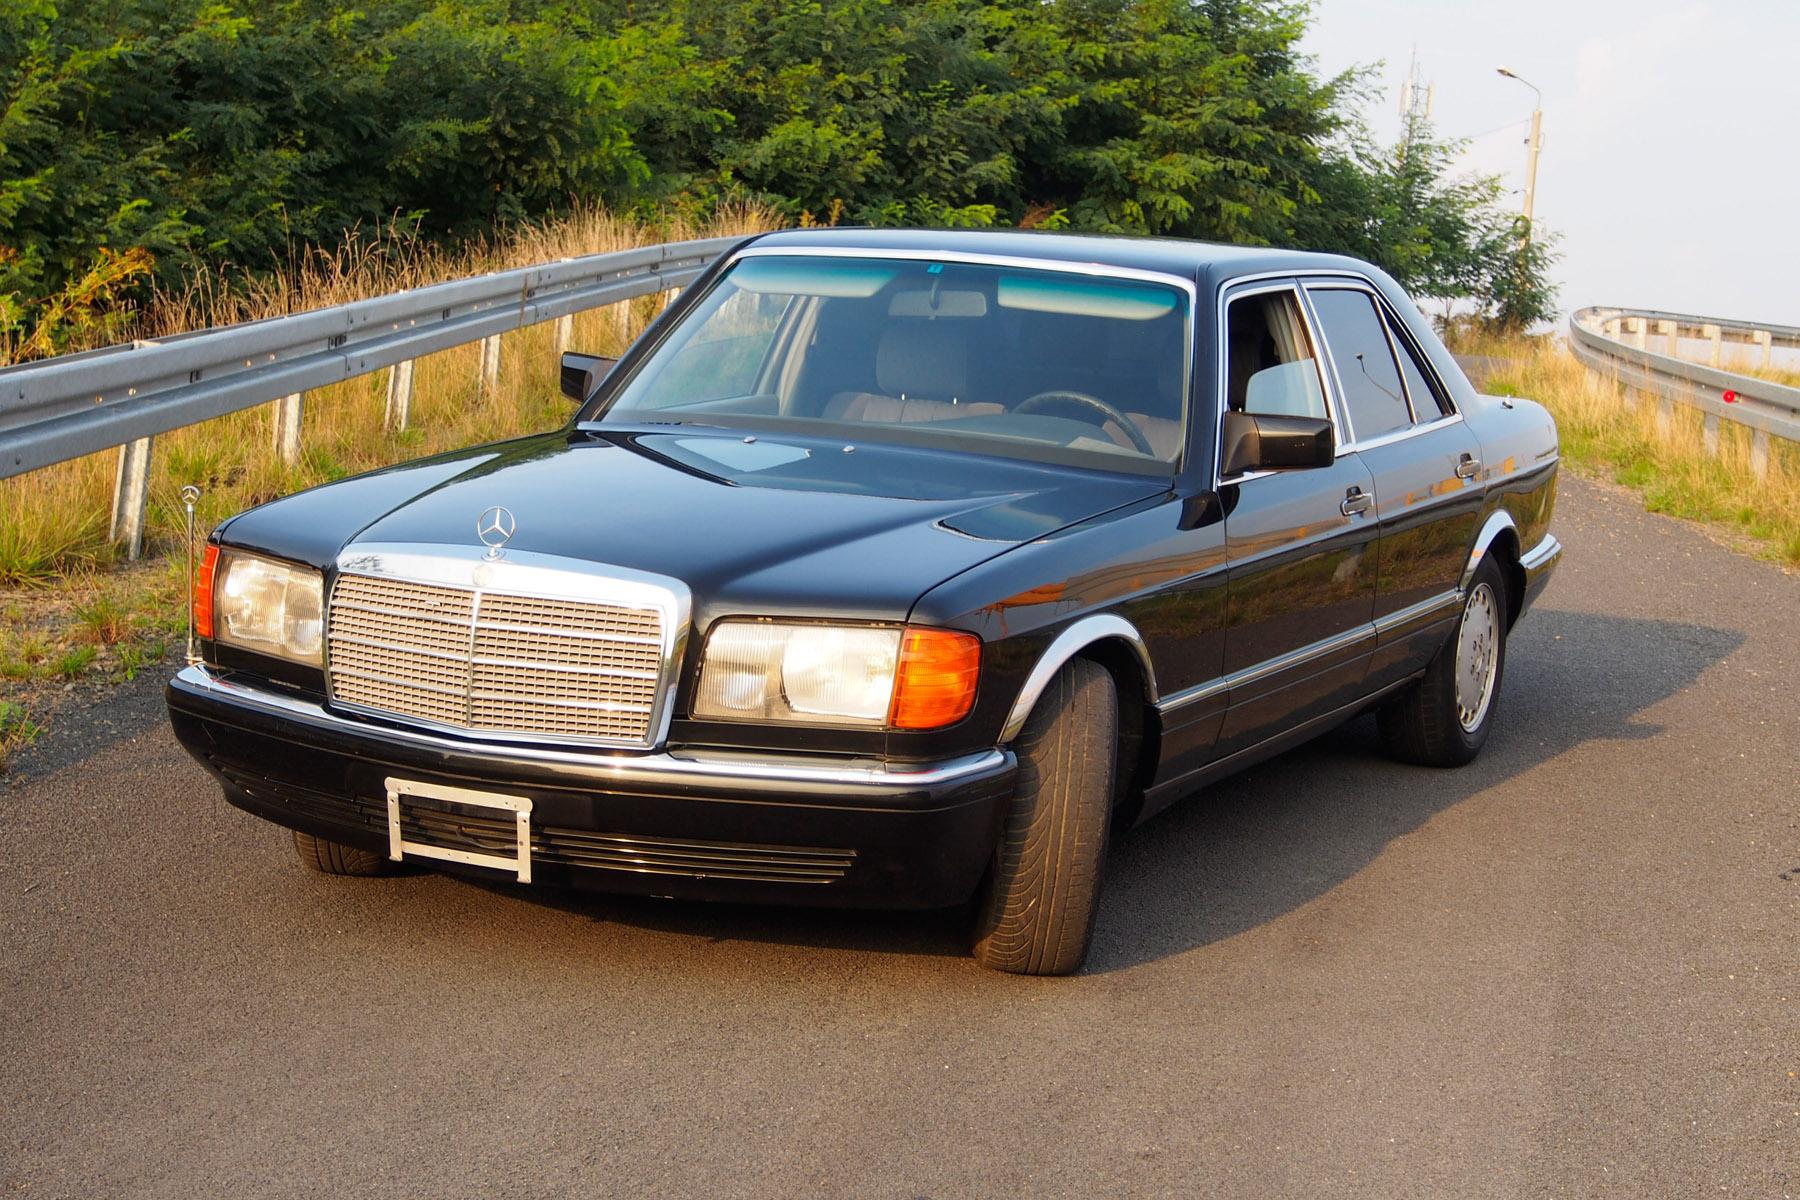 87 mercedes benz 300 se nowex cars for Mercedes benz 300 se